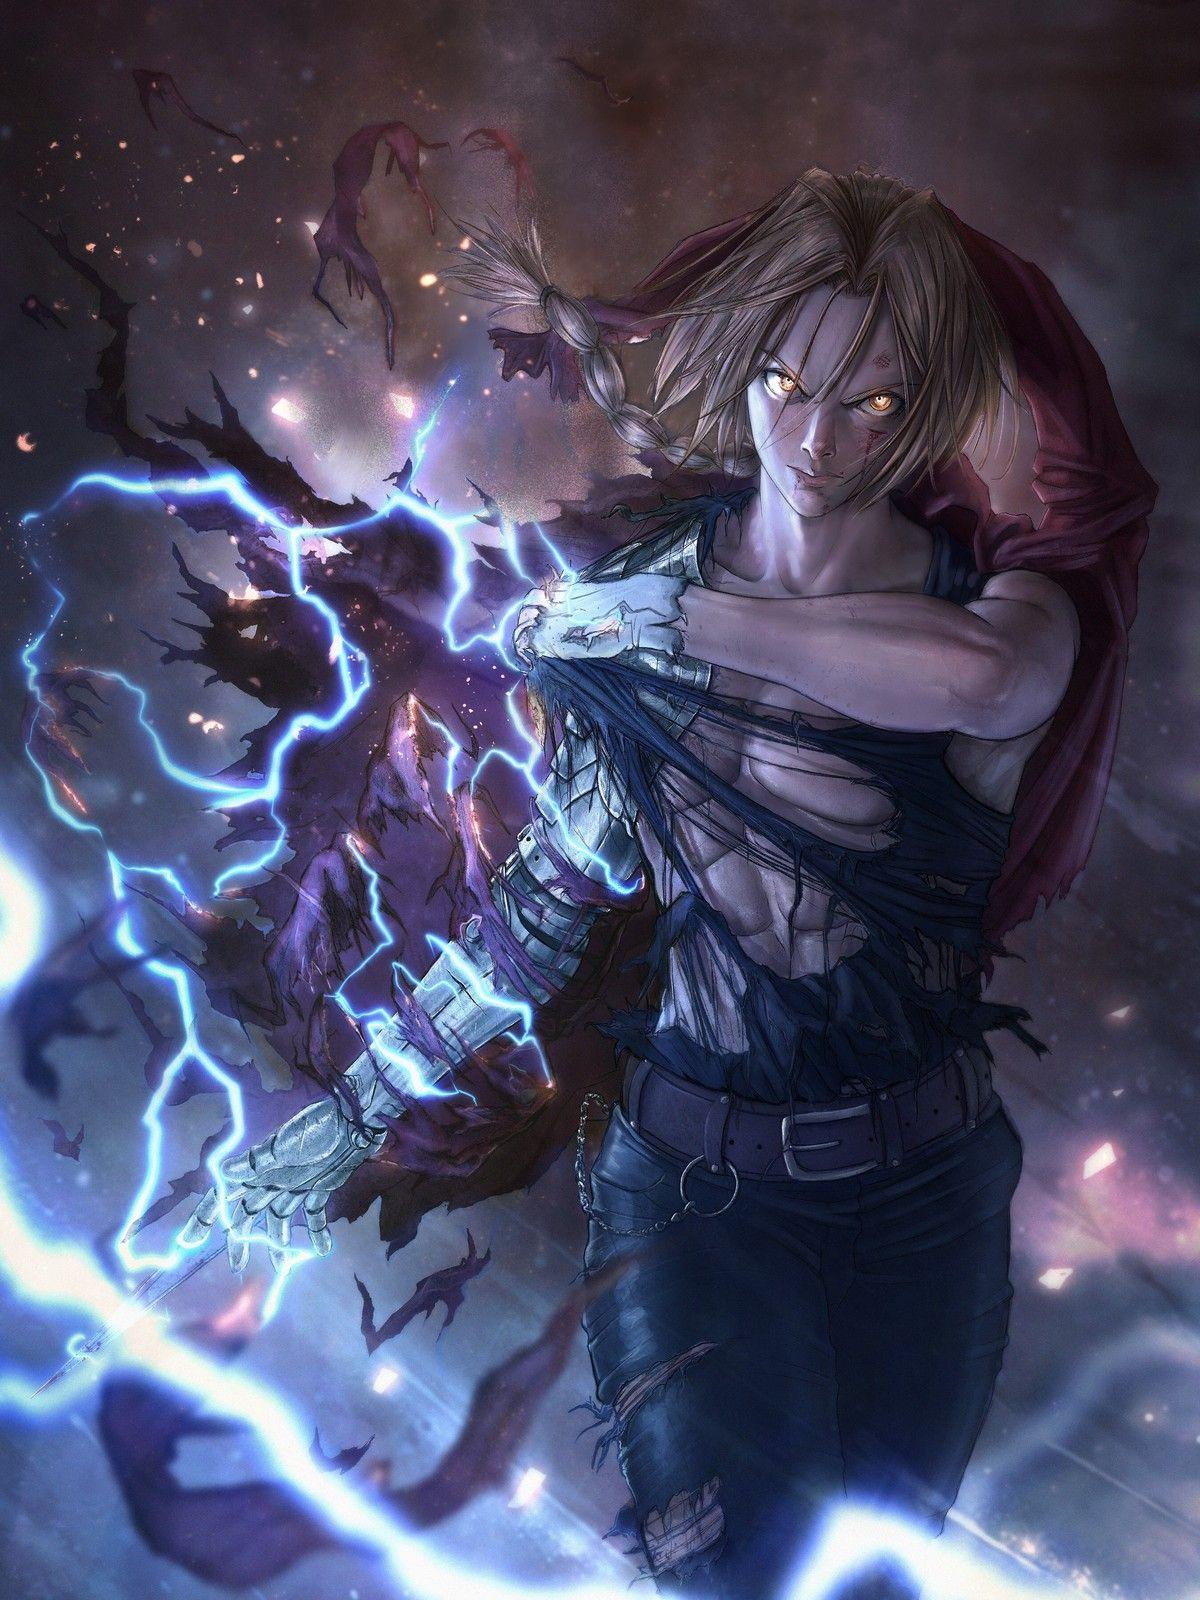 Fullmetal Alchemist, Jacob Noble